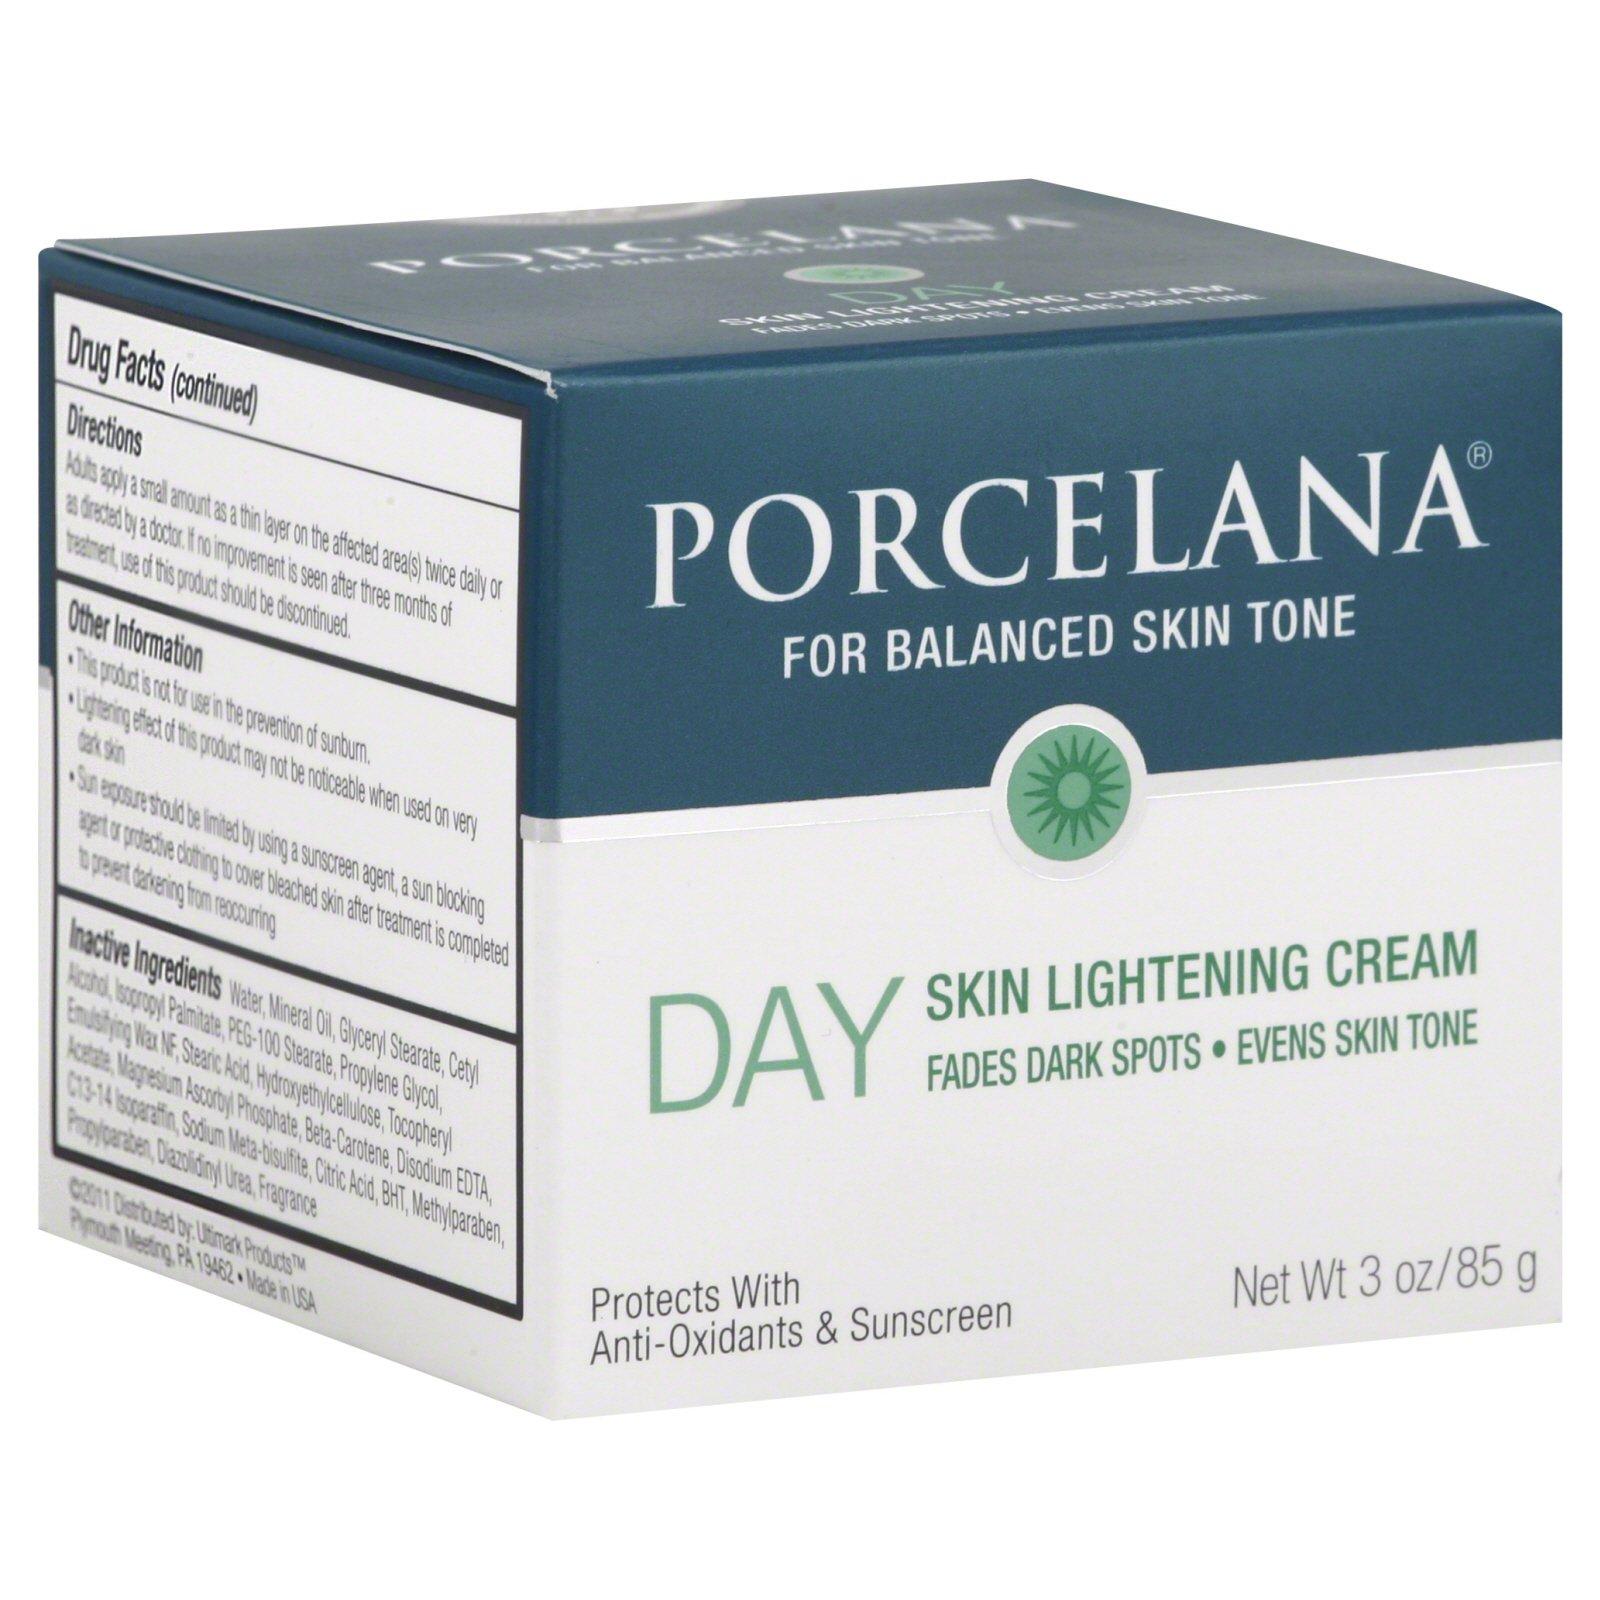 Porcelana Dark Corrector Sunscreen Daytime